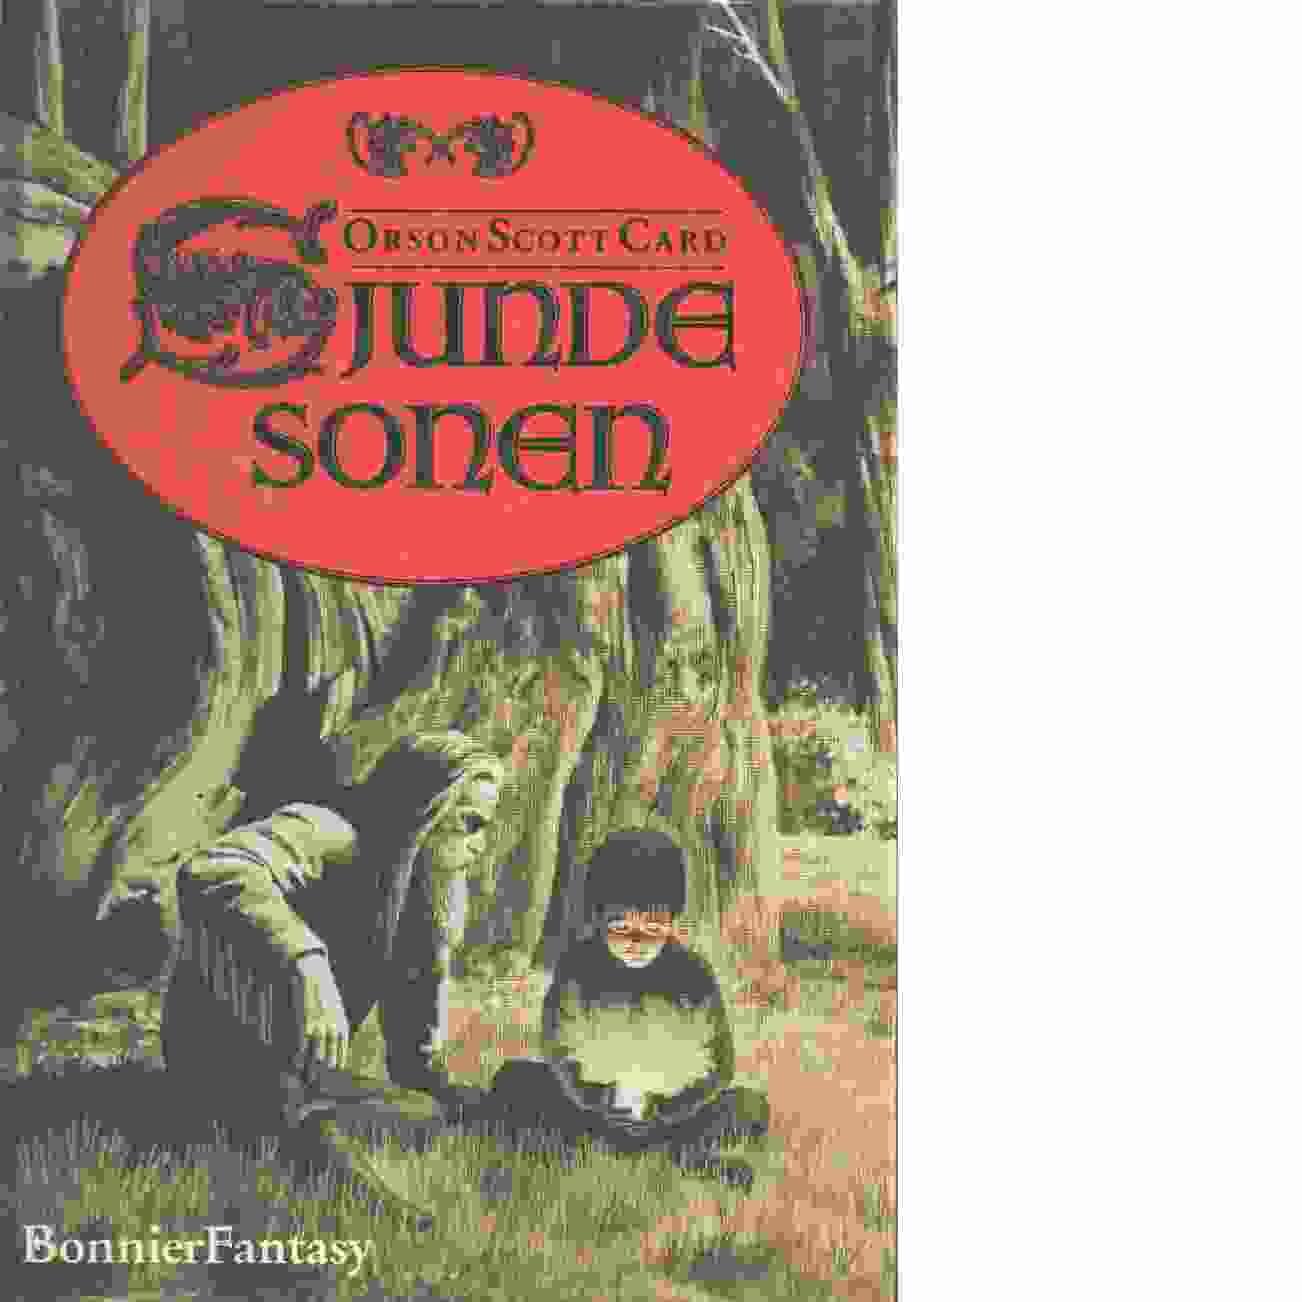 Sjunde sonen - Card, Orson Scott